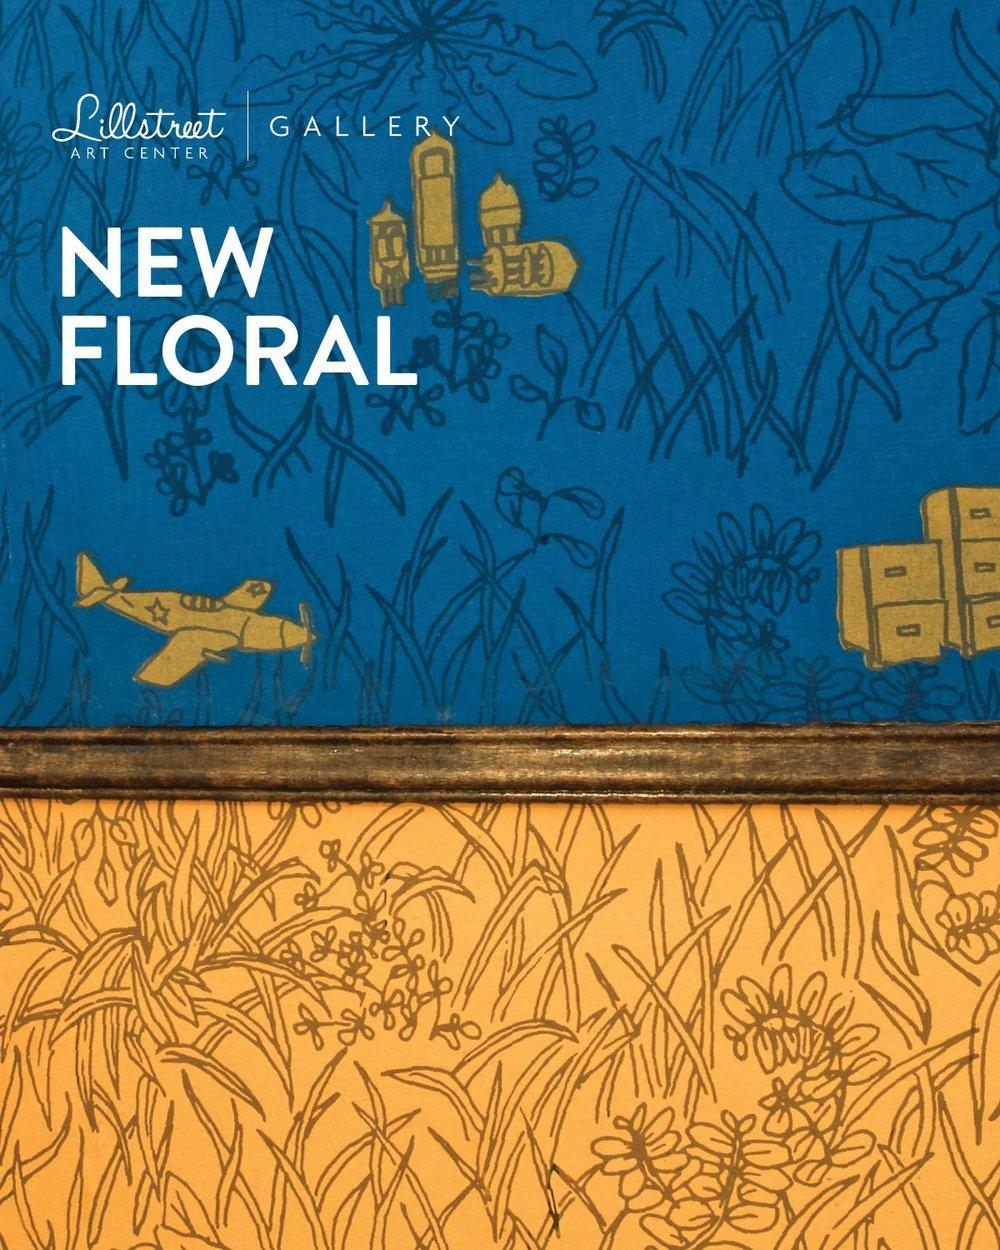 2015   Curator,  New Floral , Lillstreet Art Center, Chicago,IL  Arts, Literature & Language Development Workshop, Pleasanton Unified School District Summer Institute, Pleasanton, CA